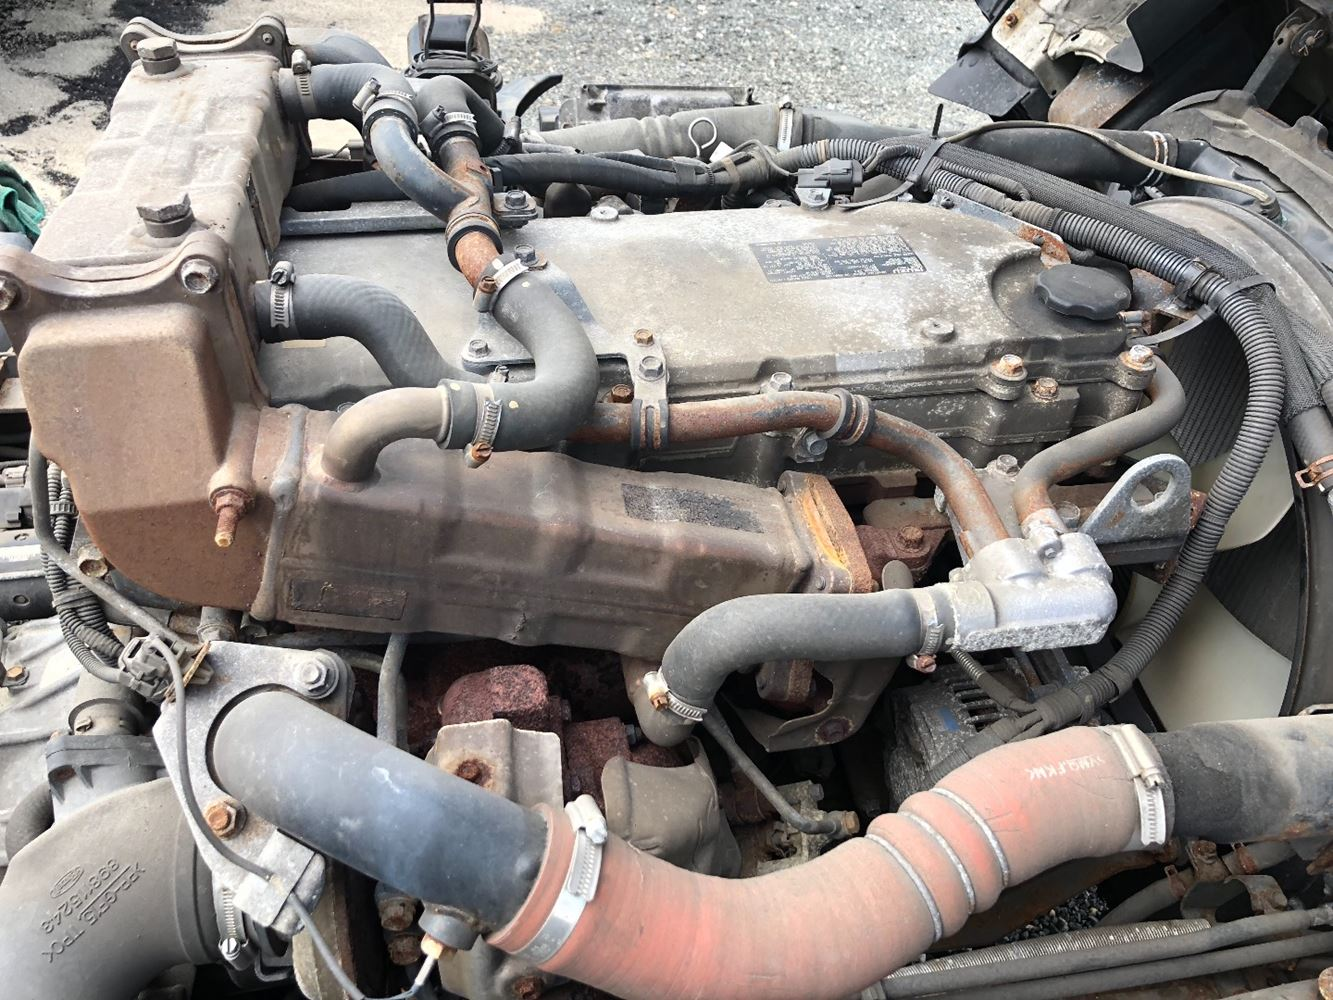 2012 ISUZU 4HK1-TC ENGINE ASSEMBLY TRUCK PARTS #698995